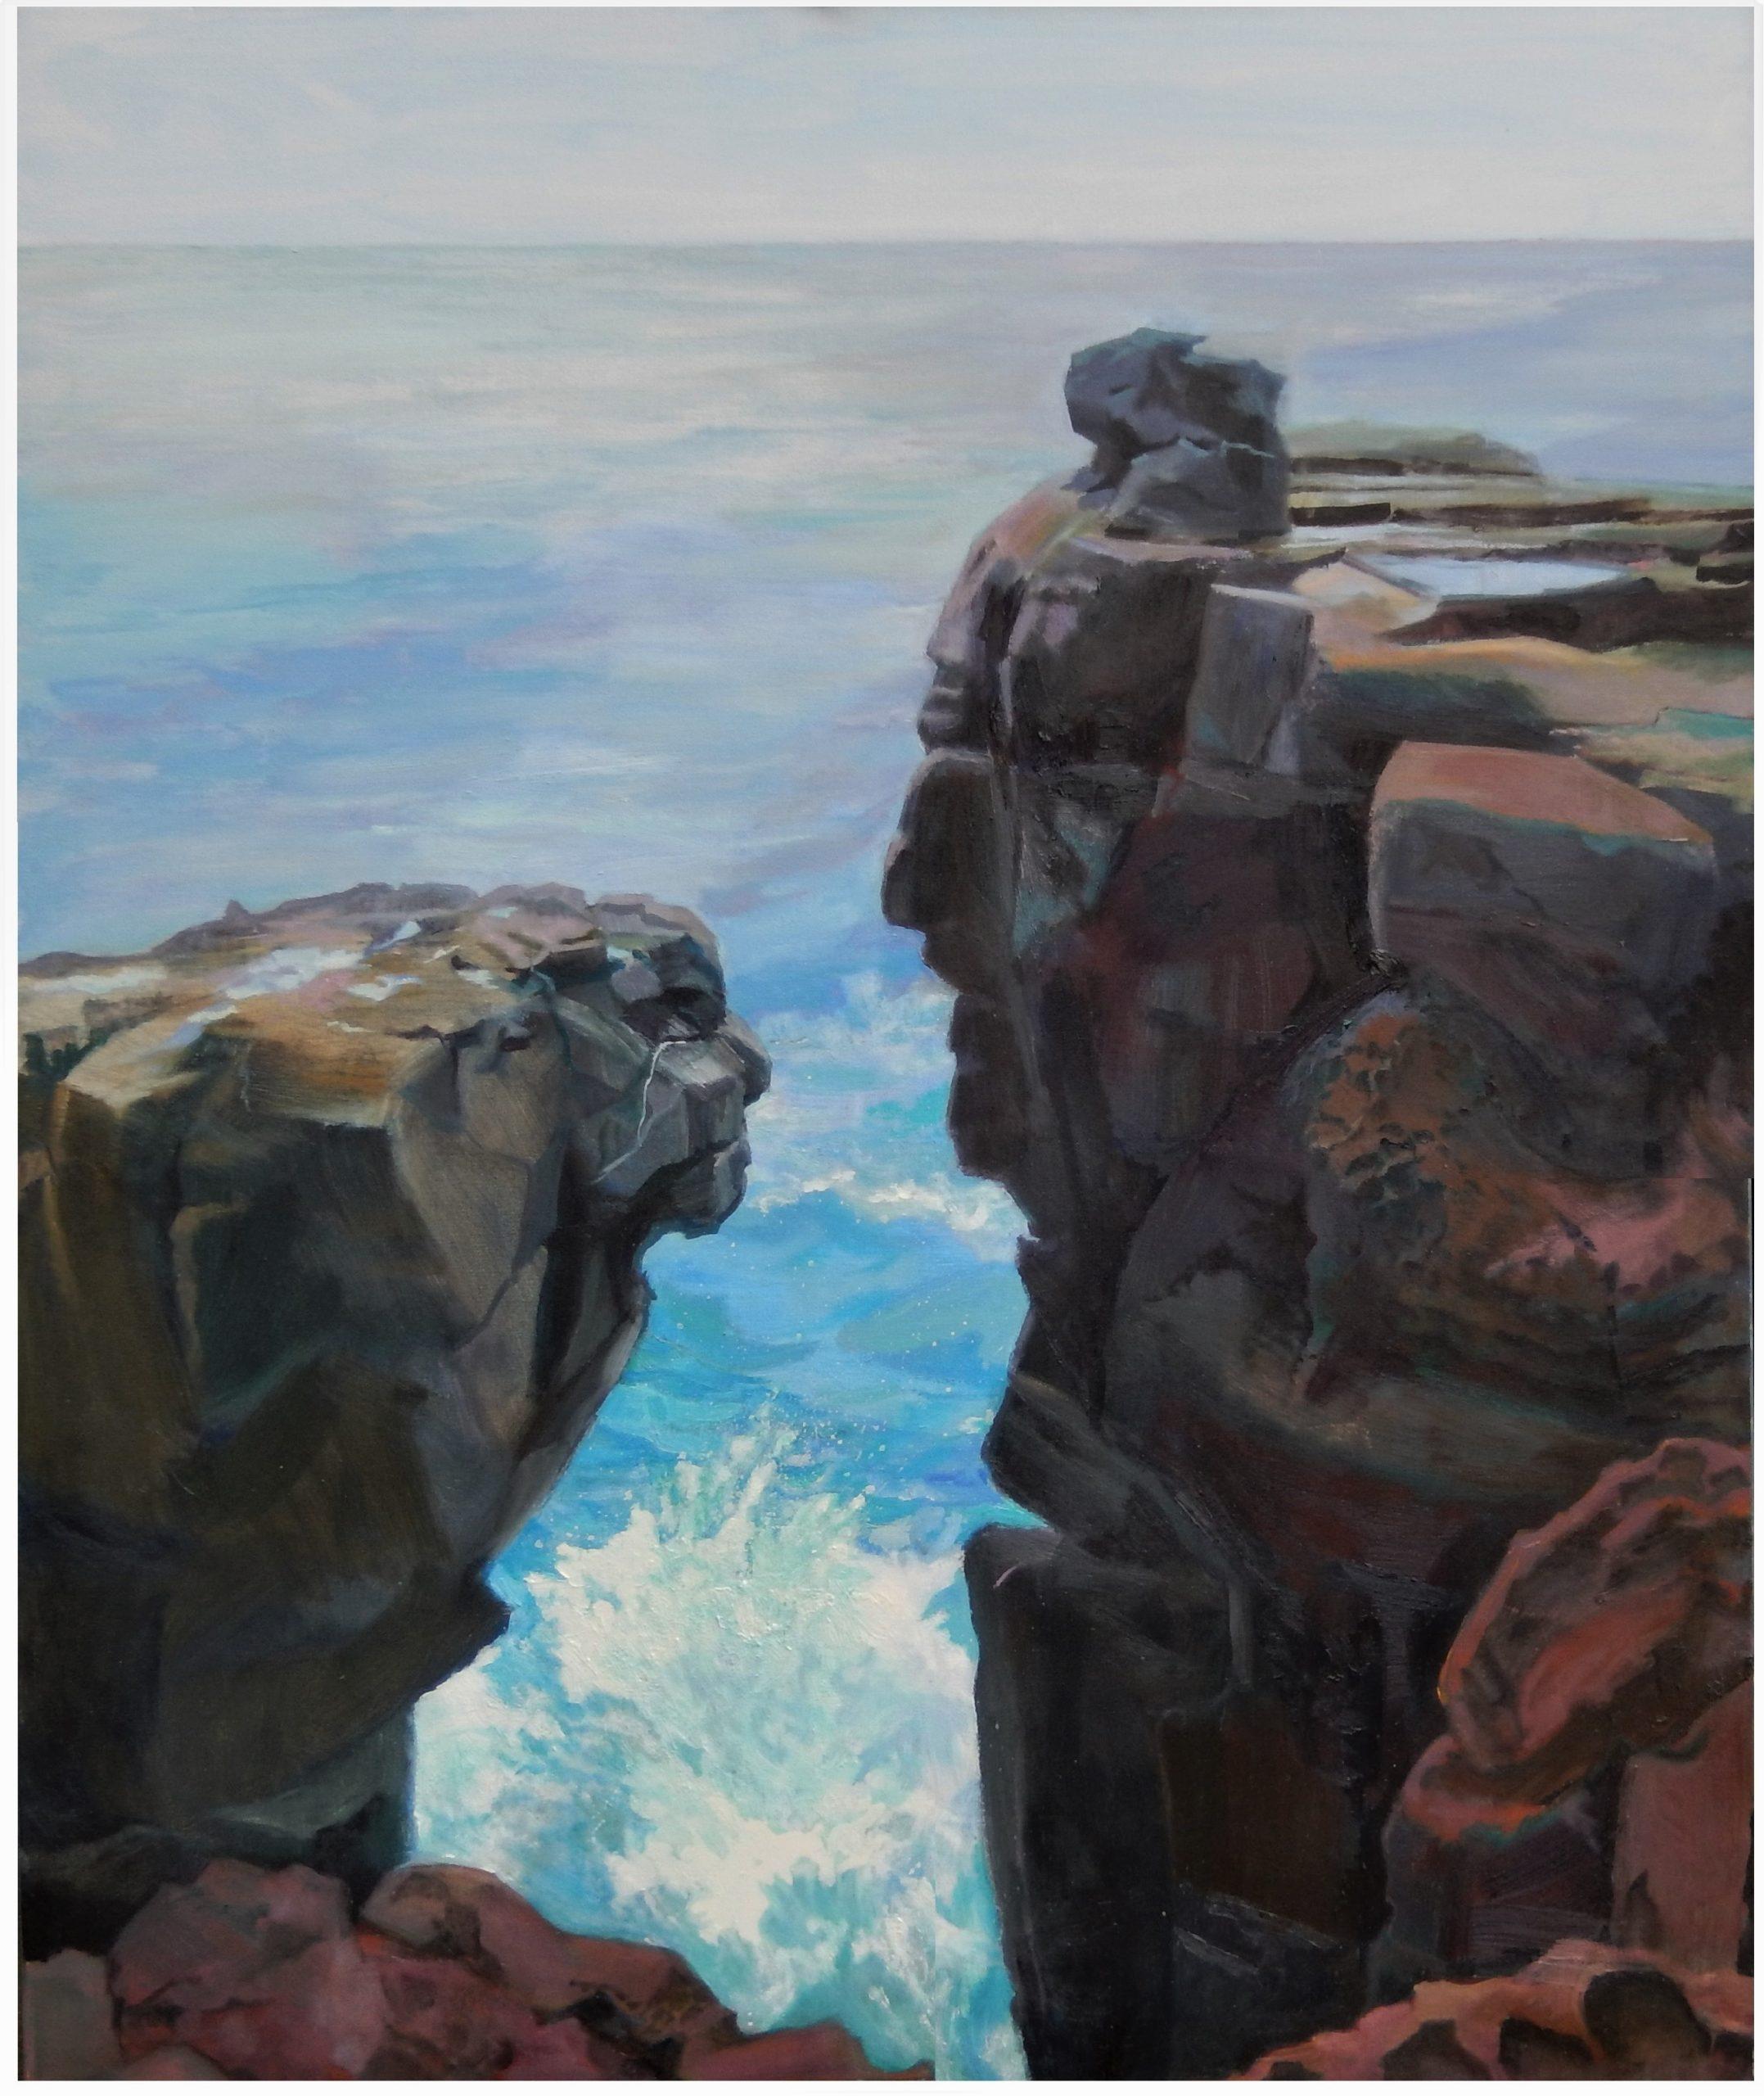 651 Roche ki plèr, natuurstudie – olieverf op doek – 120 x 100